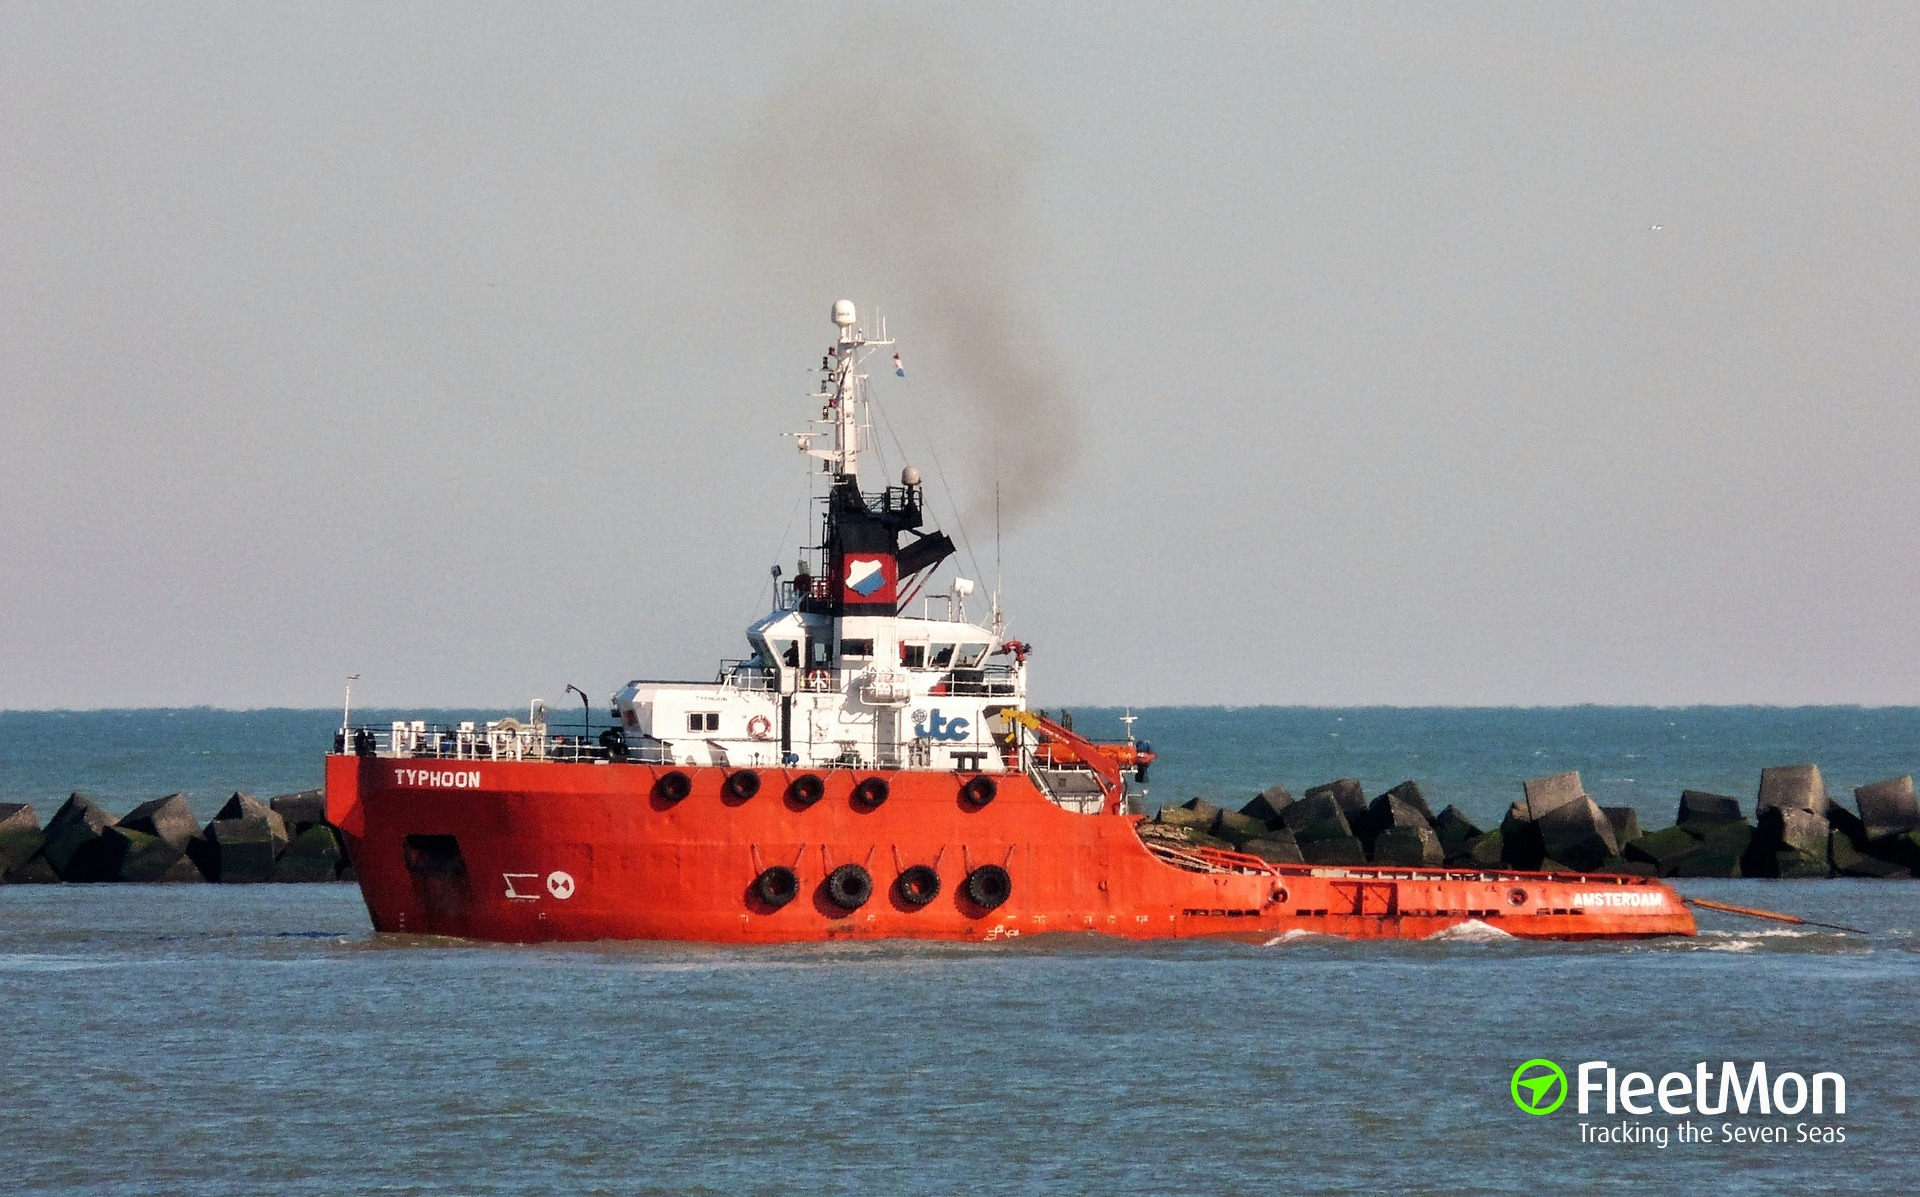 Offshore tug Gudri sank in bad weather, Nigeria